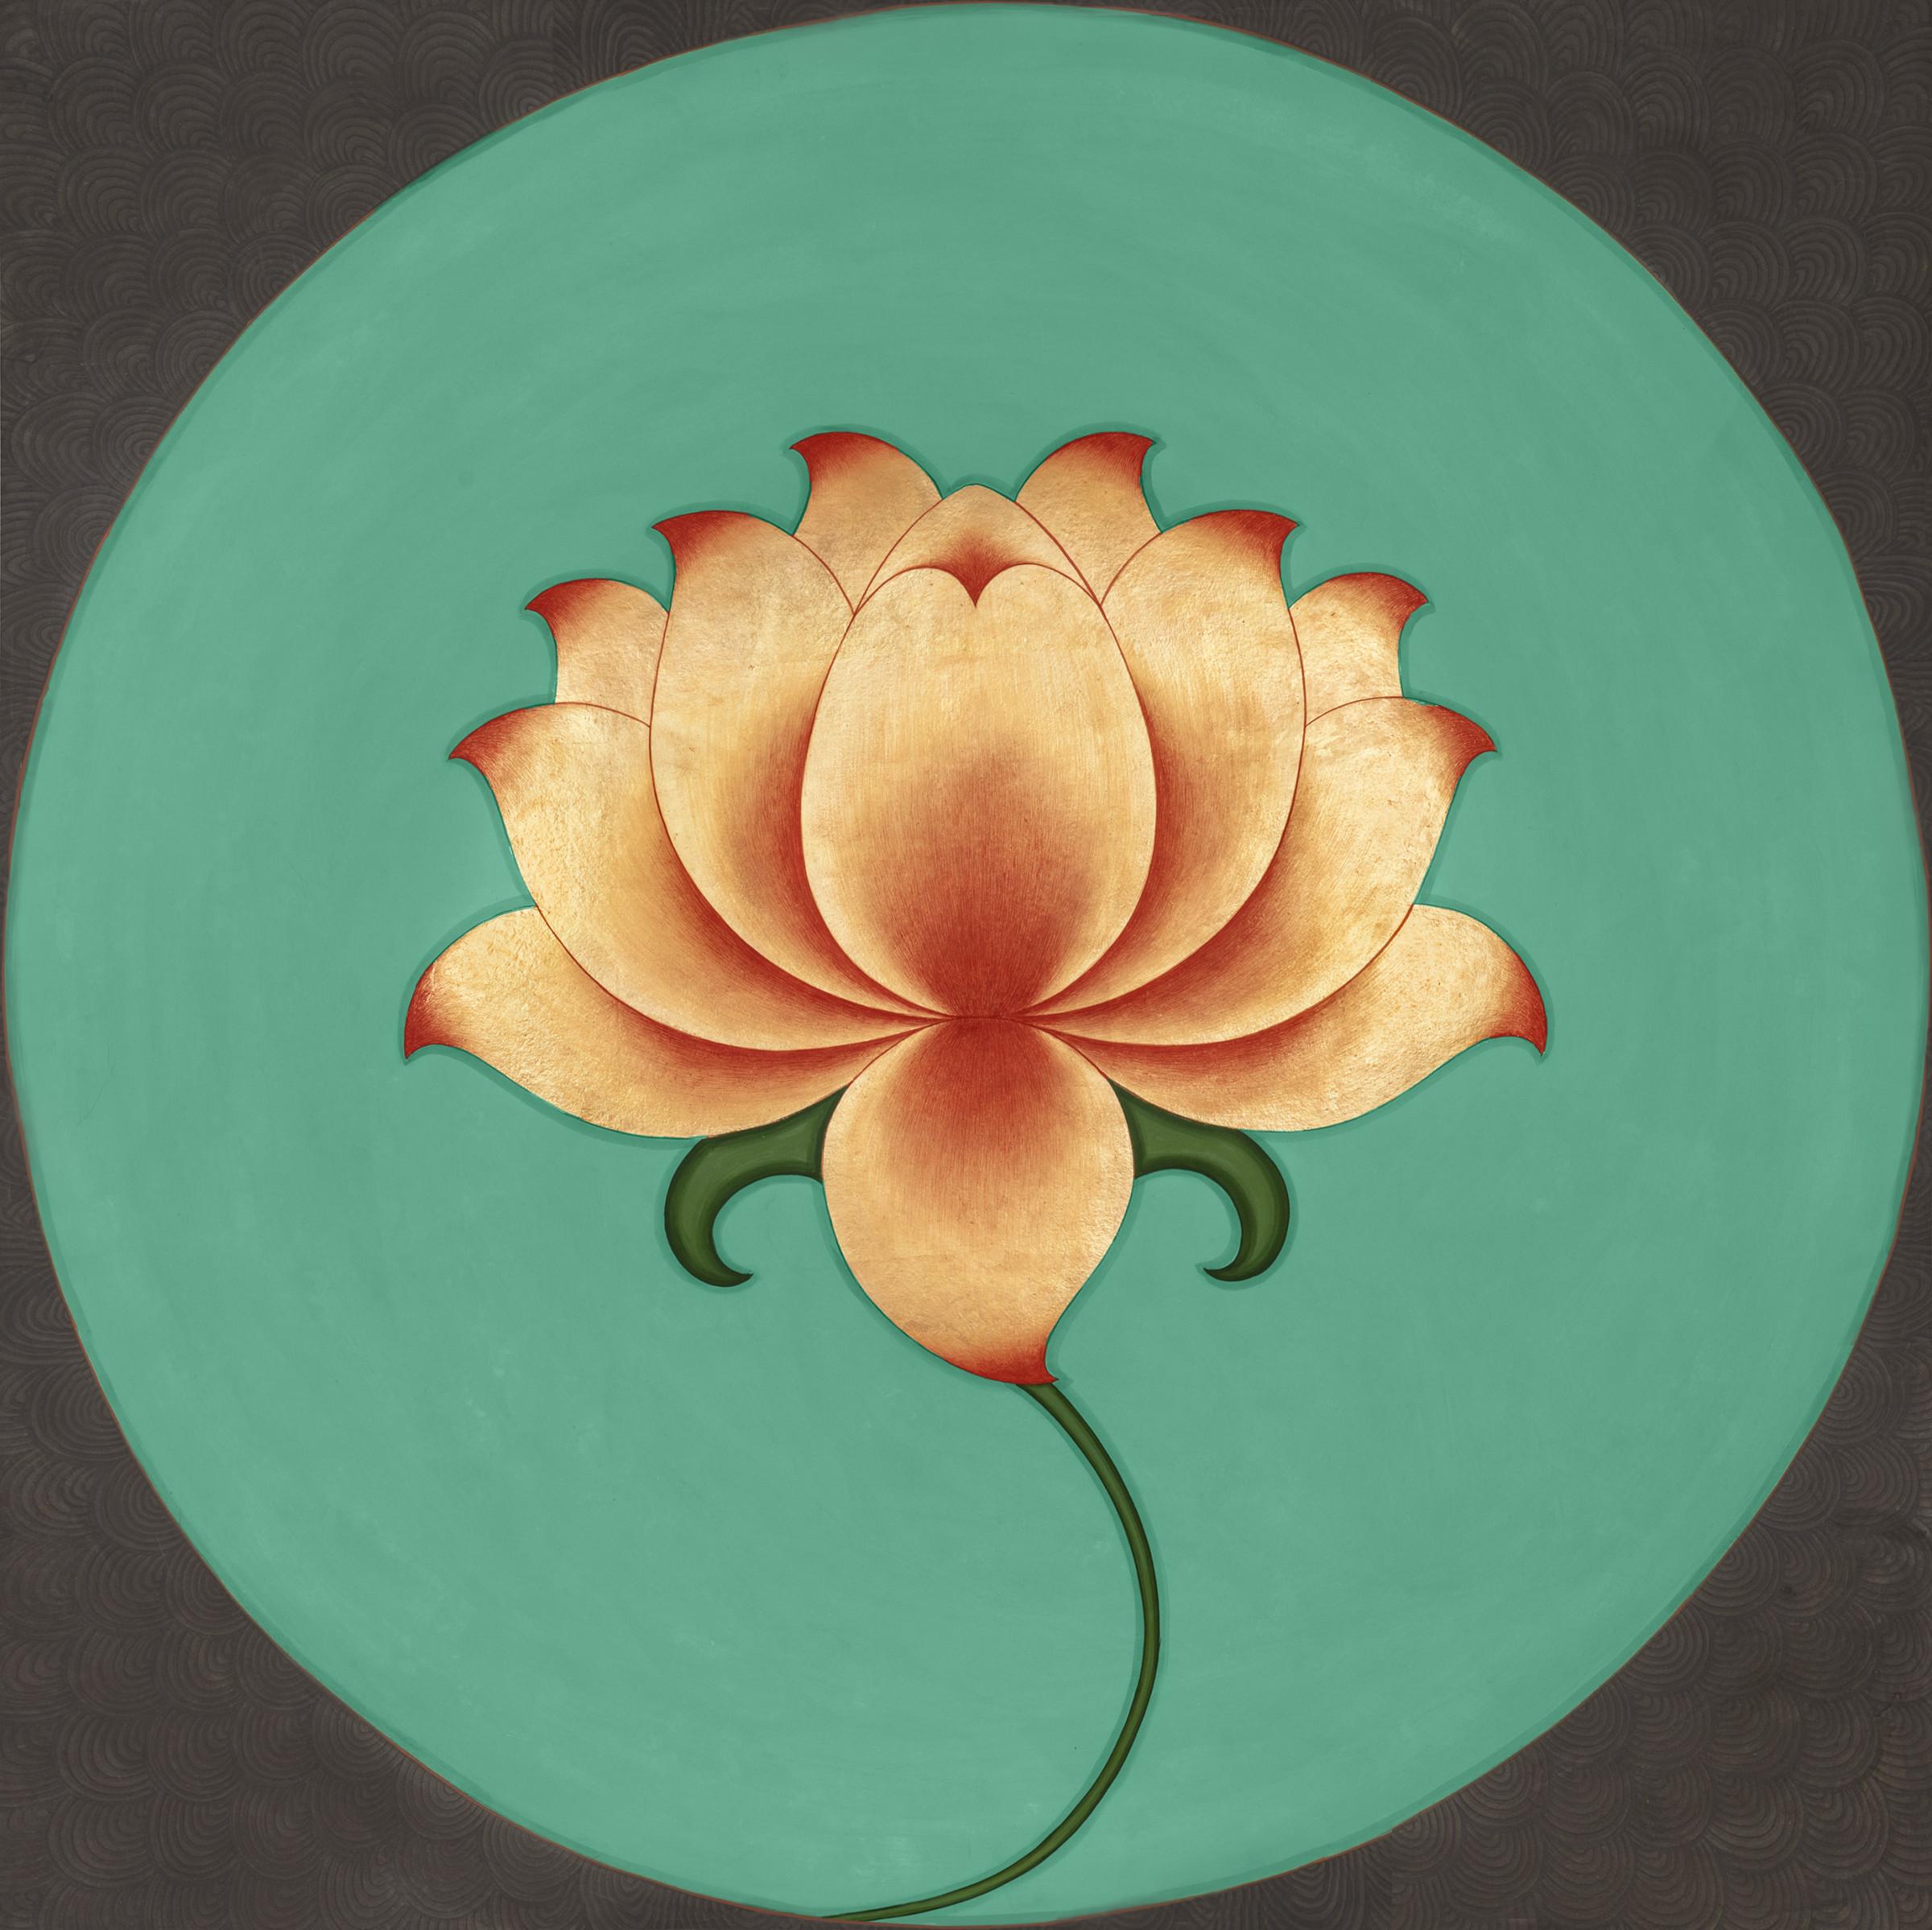 OLIVIA FRASER, 'Golden Lotus' ,  Stone pigment, gold leaf and Arabic gum on handmade sanganer pape r,  2008